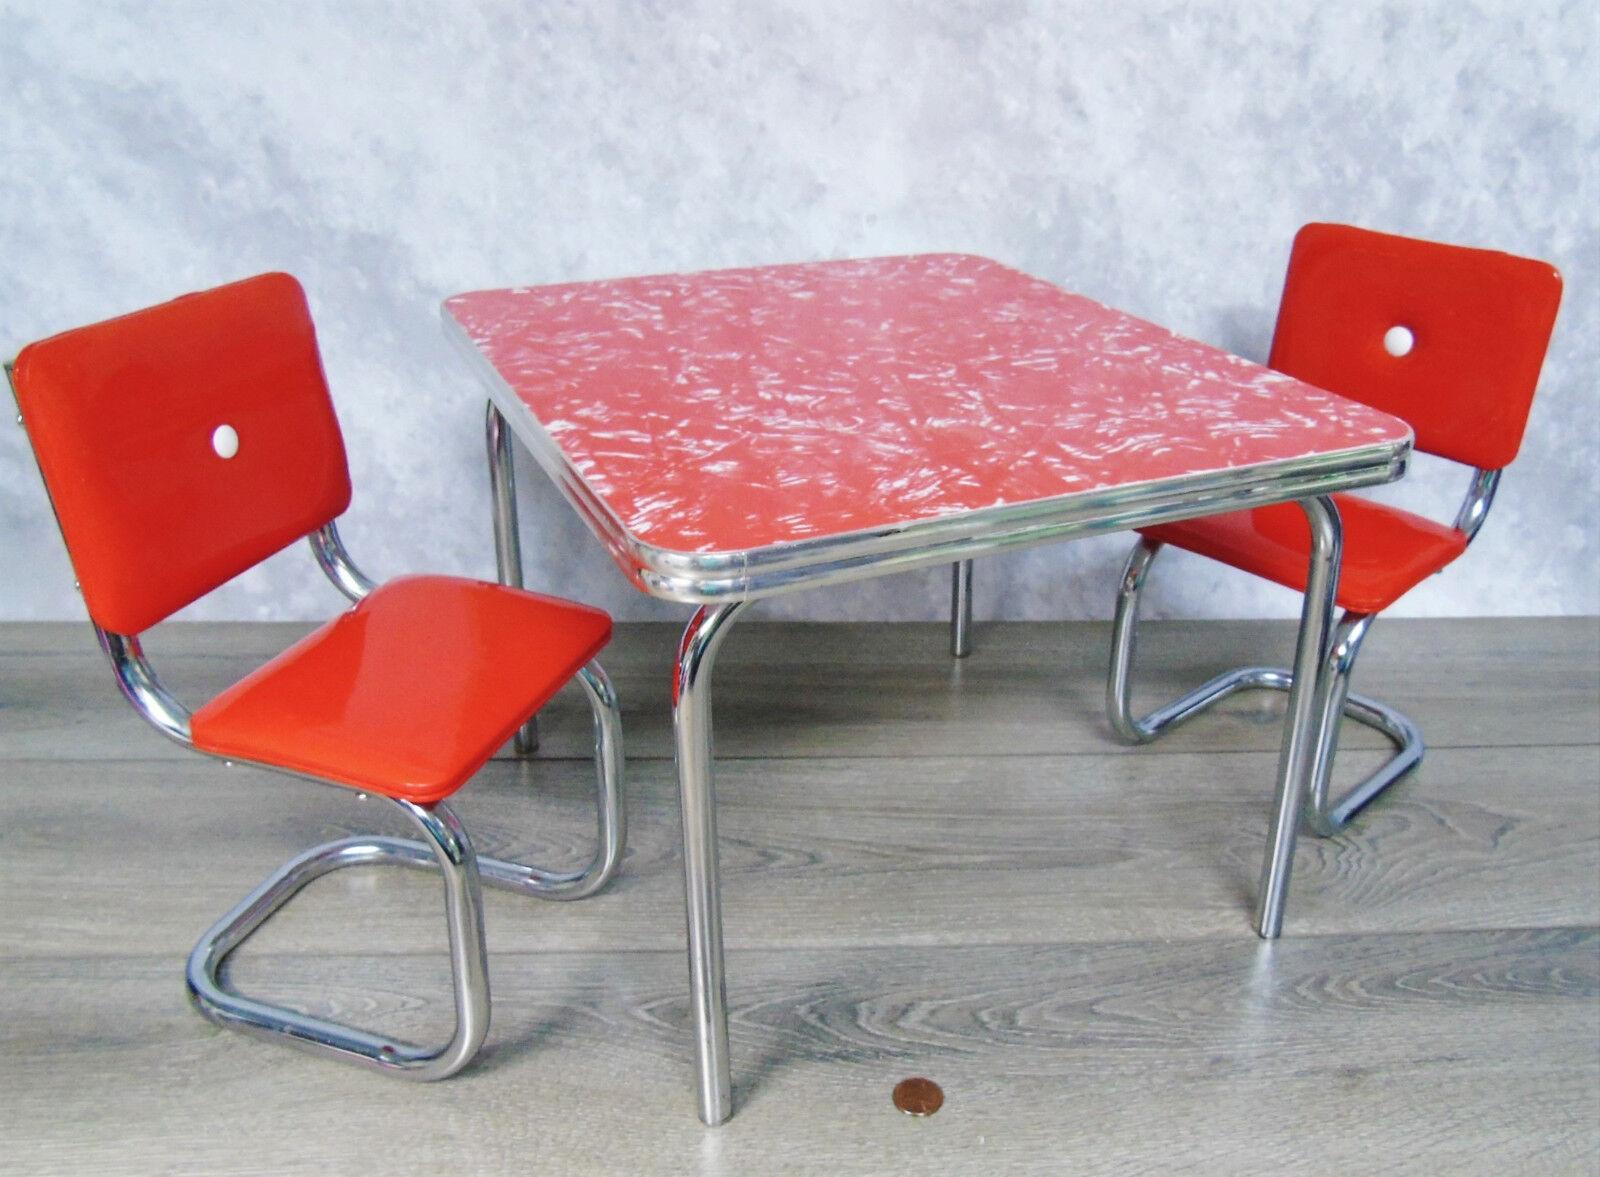 American Girl Doll Retro Chrom Tisch & Stühle Mollys Küche Set Rot Diner